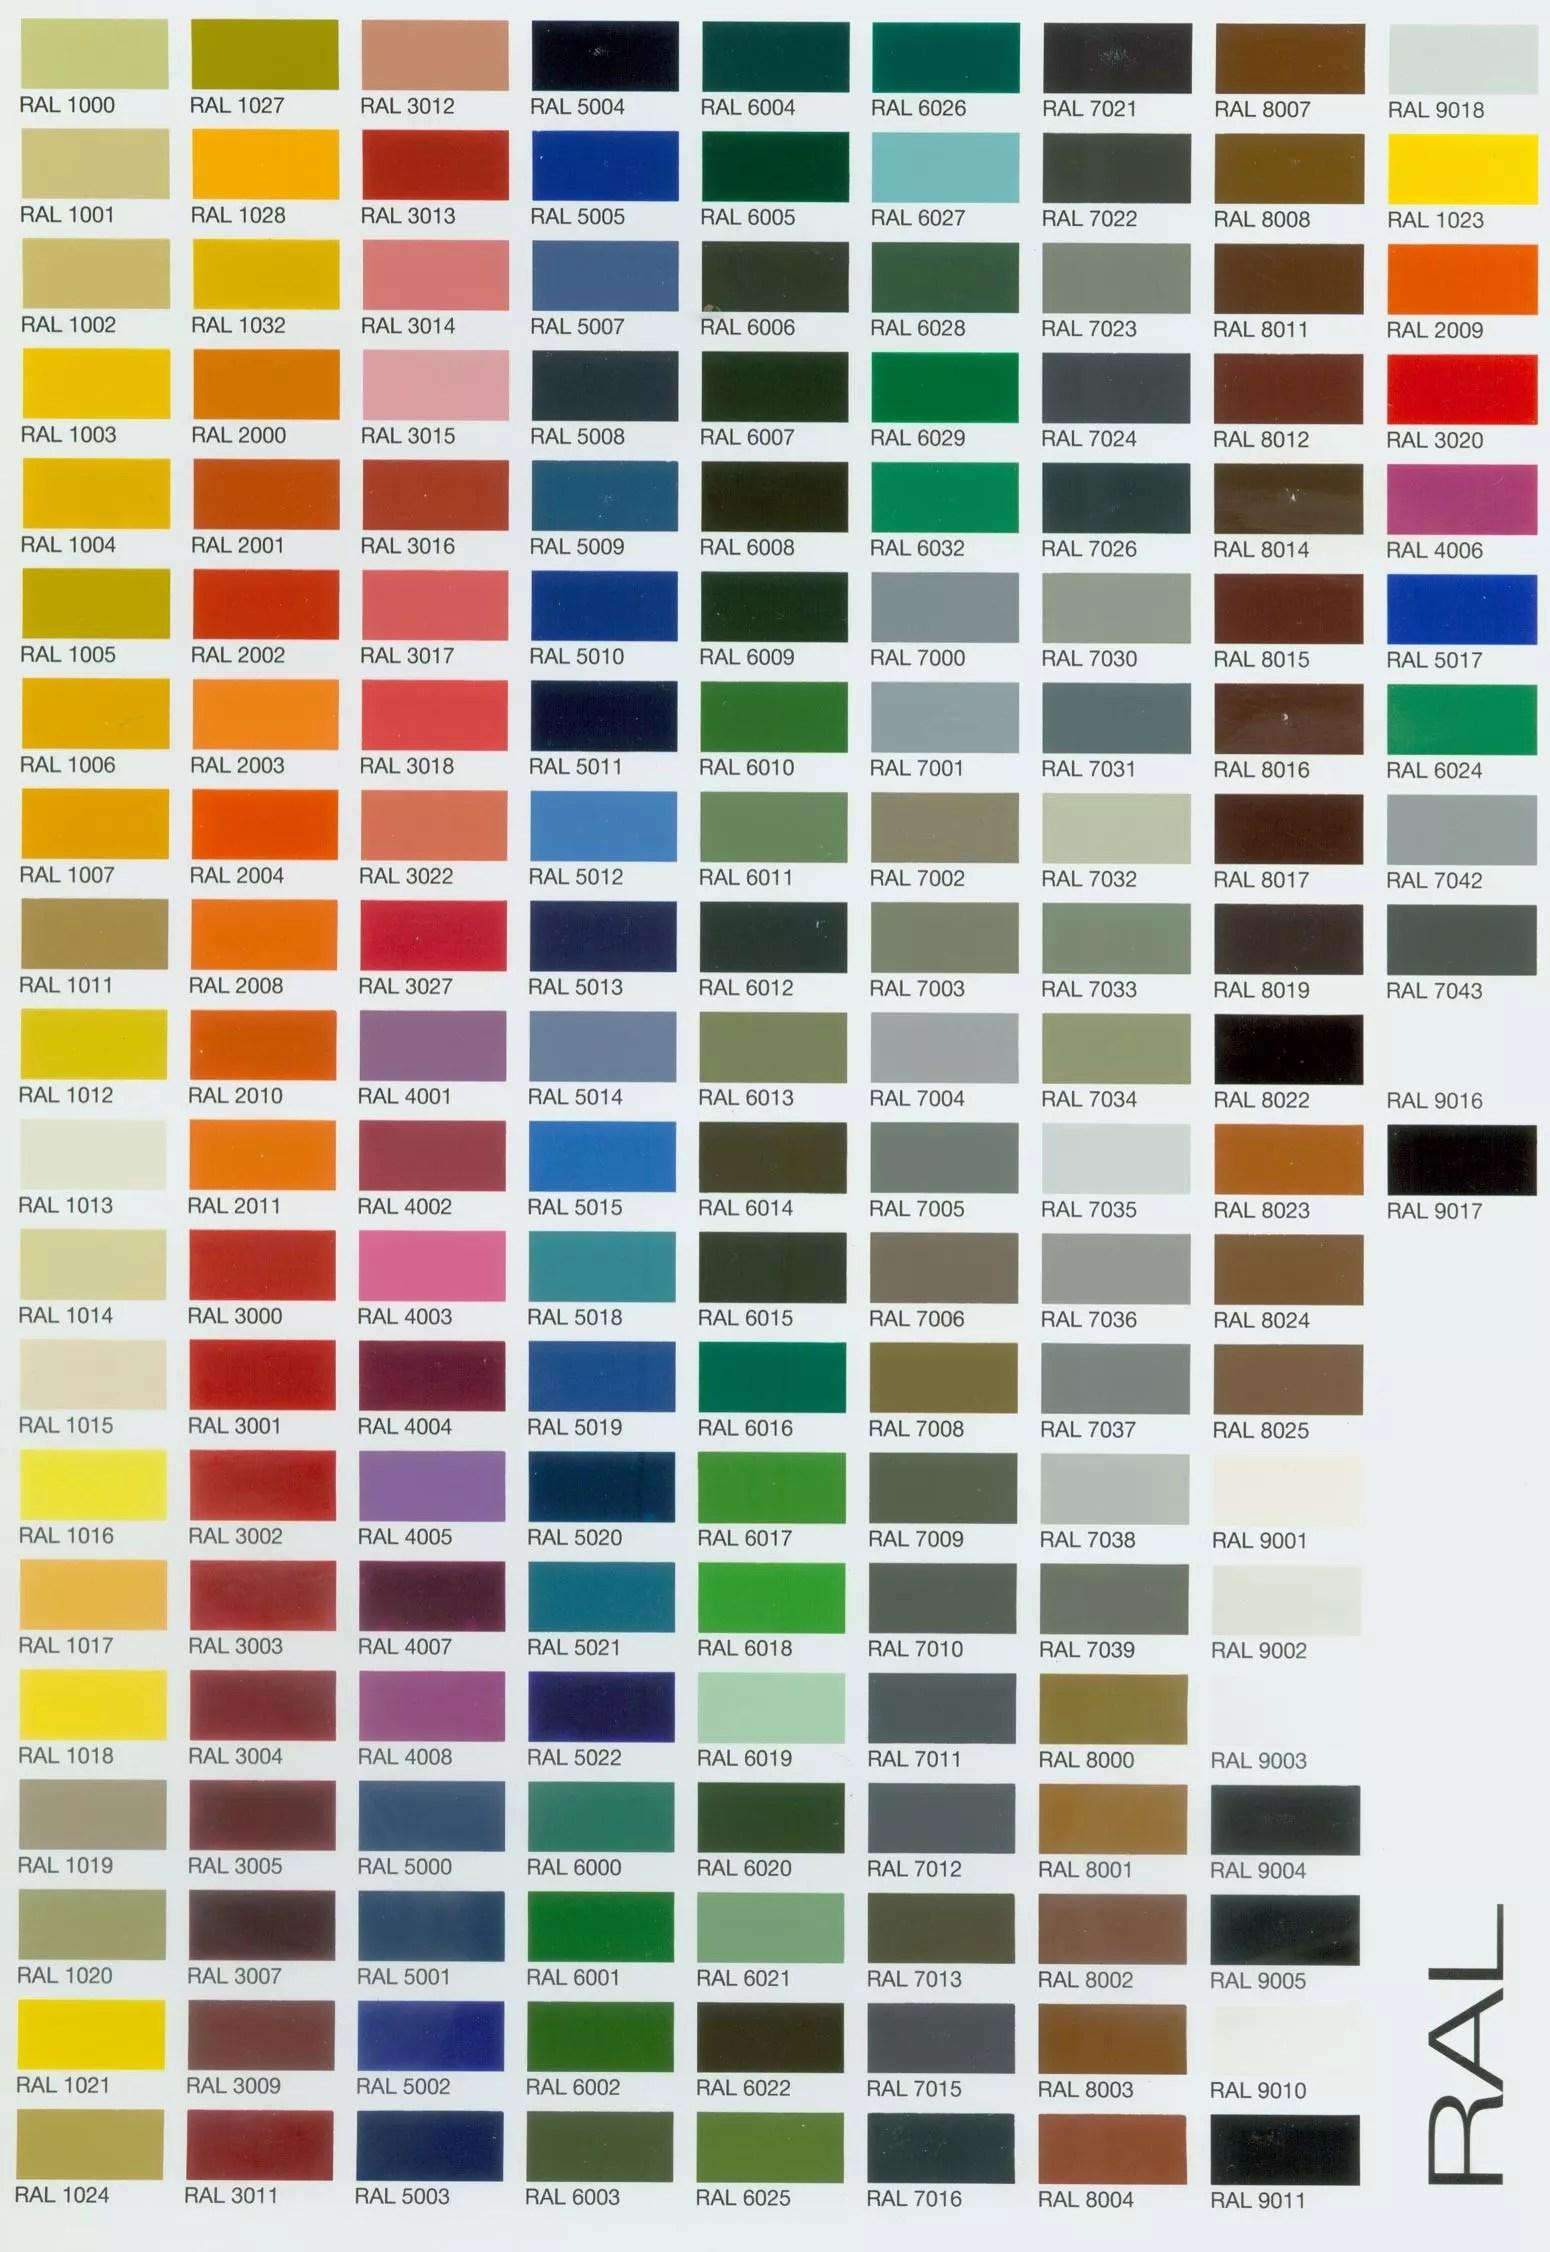 Bluestar Ral 190 Standard Ral Color For 24 30